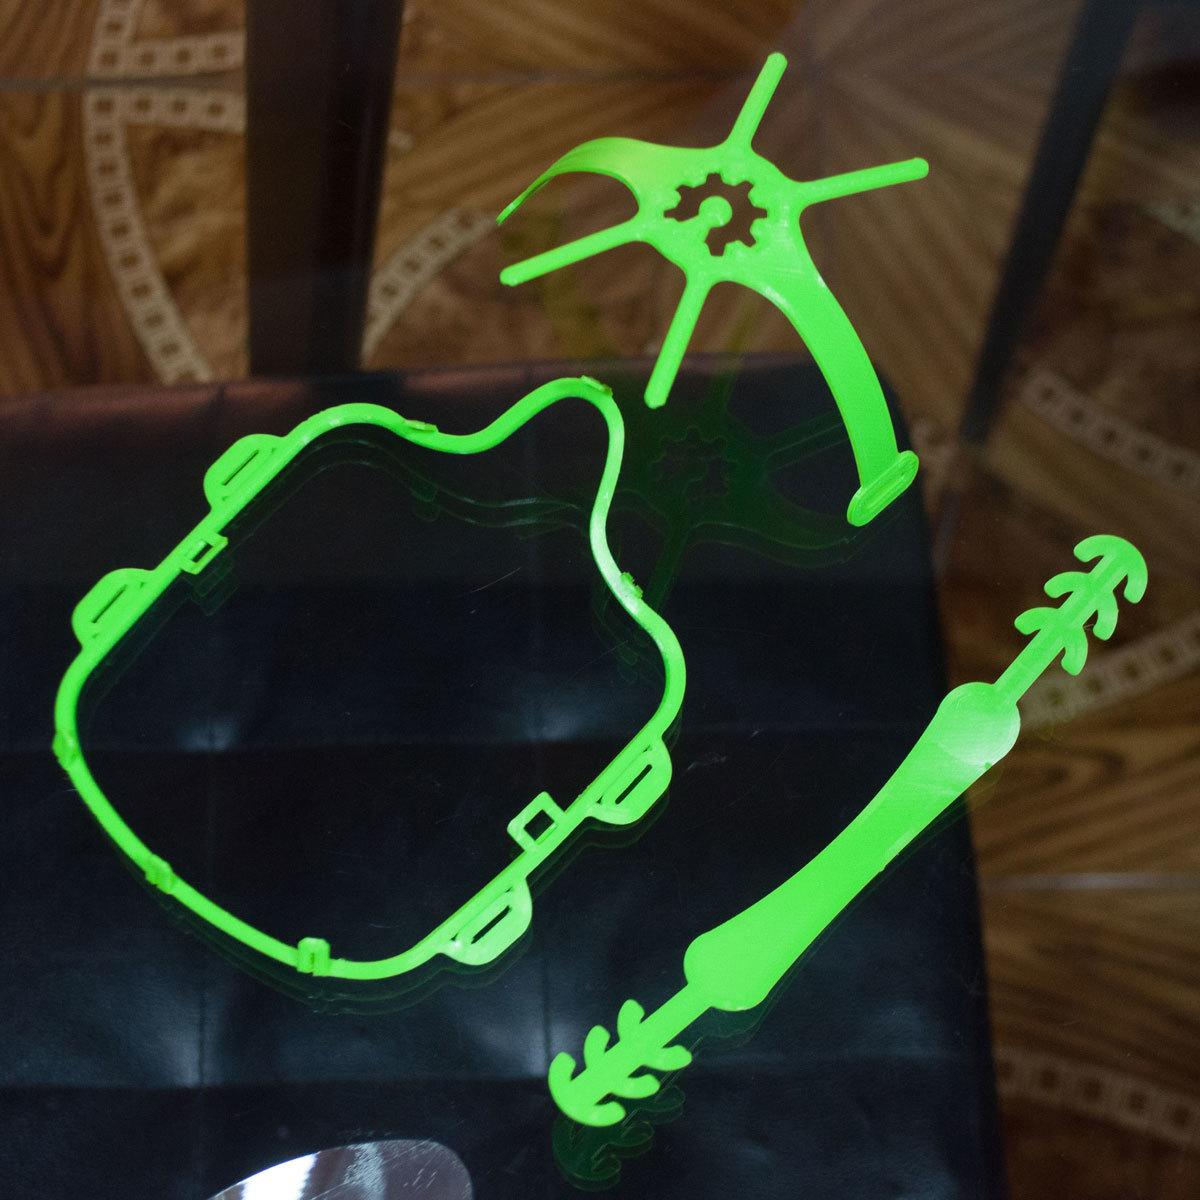 8.jpg Download free STL file Hermetic Mask • 3D print design, Checho3d